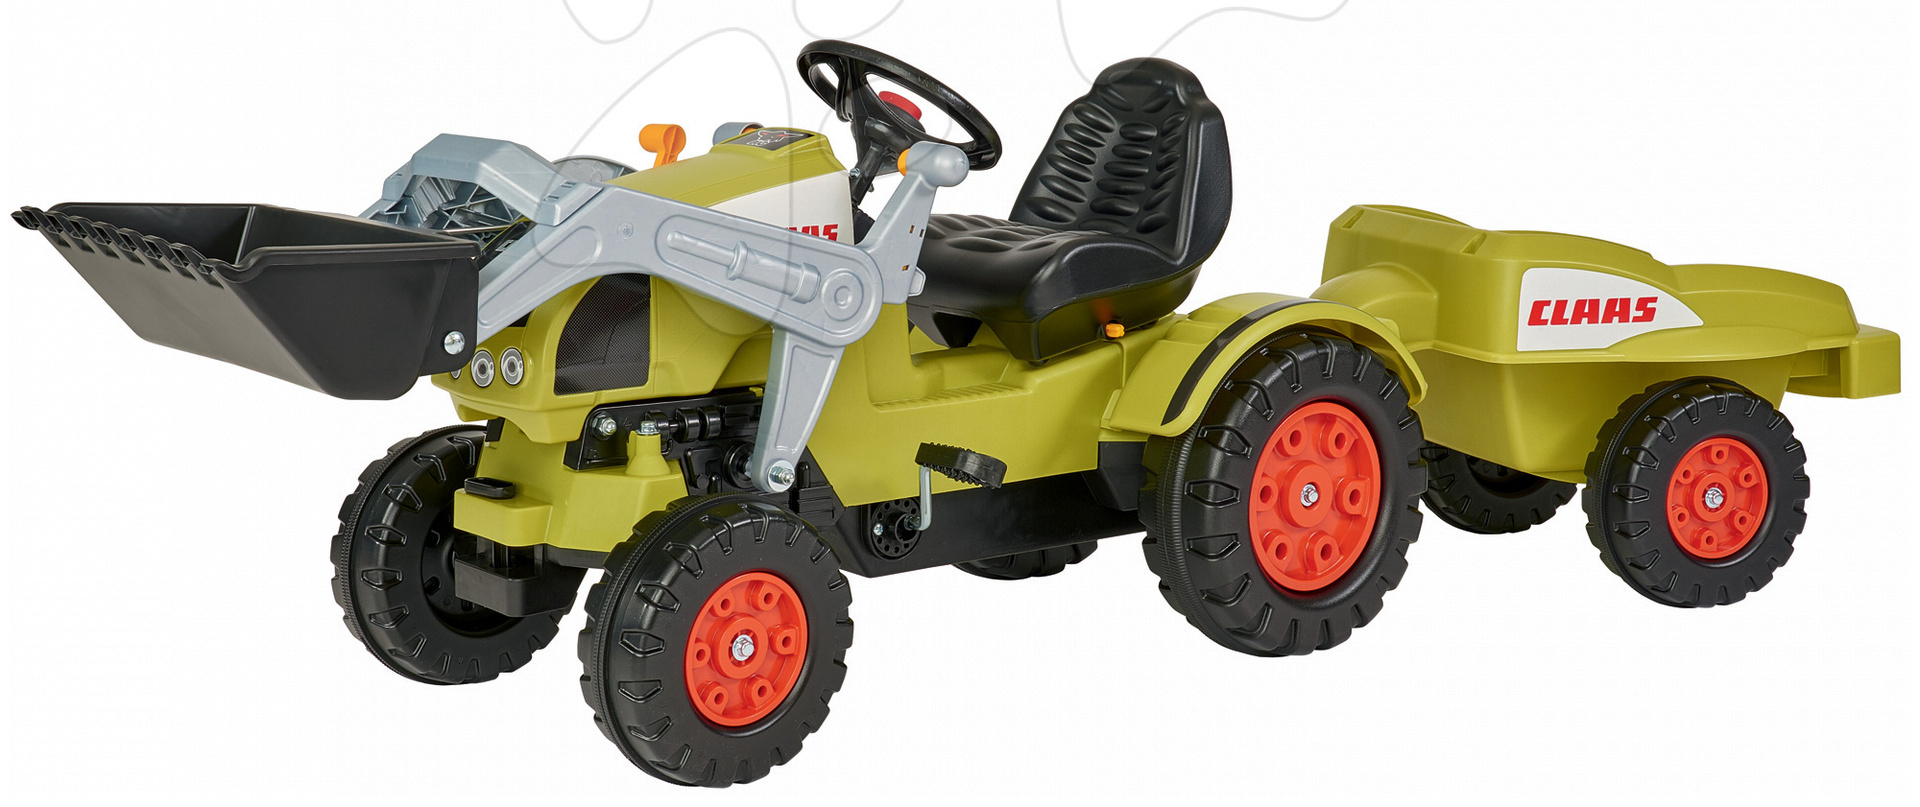 Otroška vozila na pedala - Traktor na pedale Claas Celtis BIG s prikolico